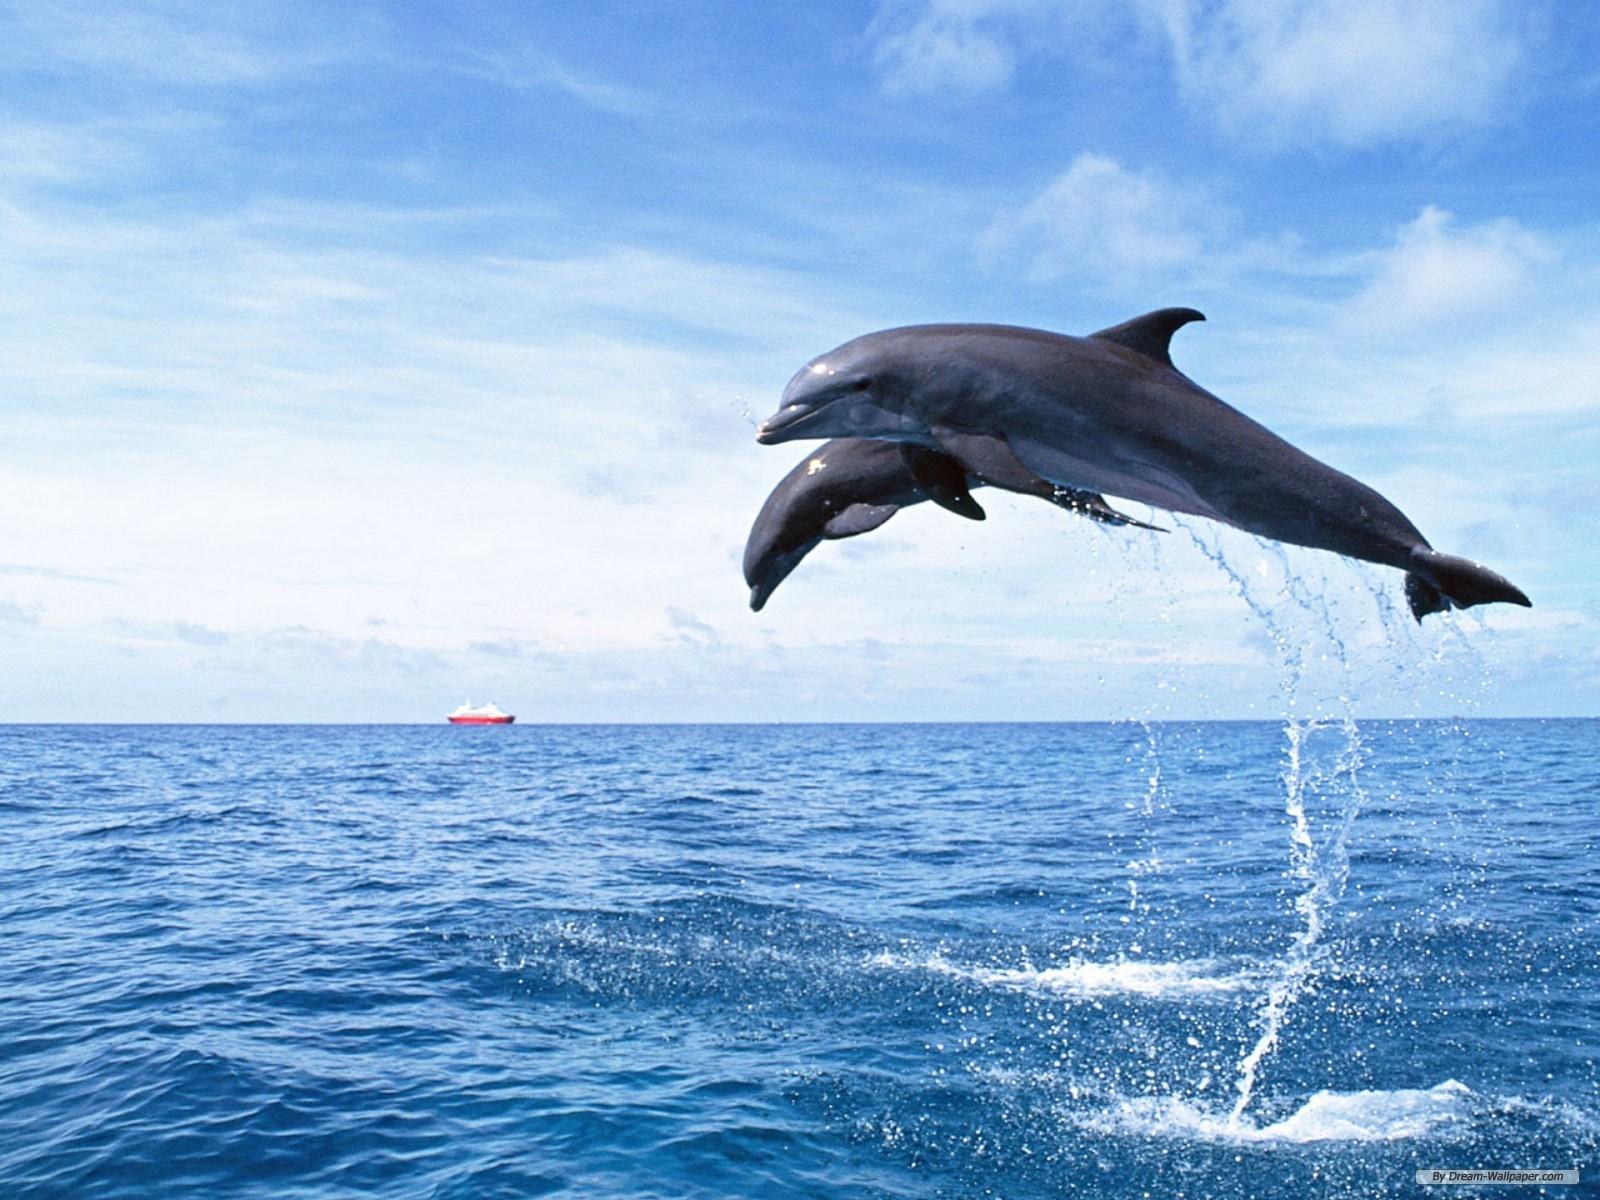 HD Wallpaper: dolphin hd wallpapers